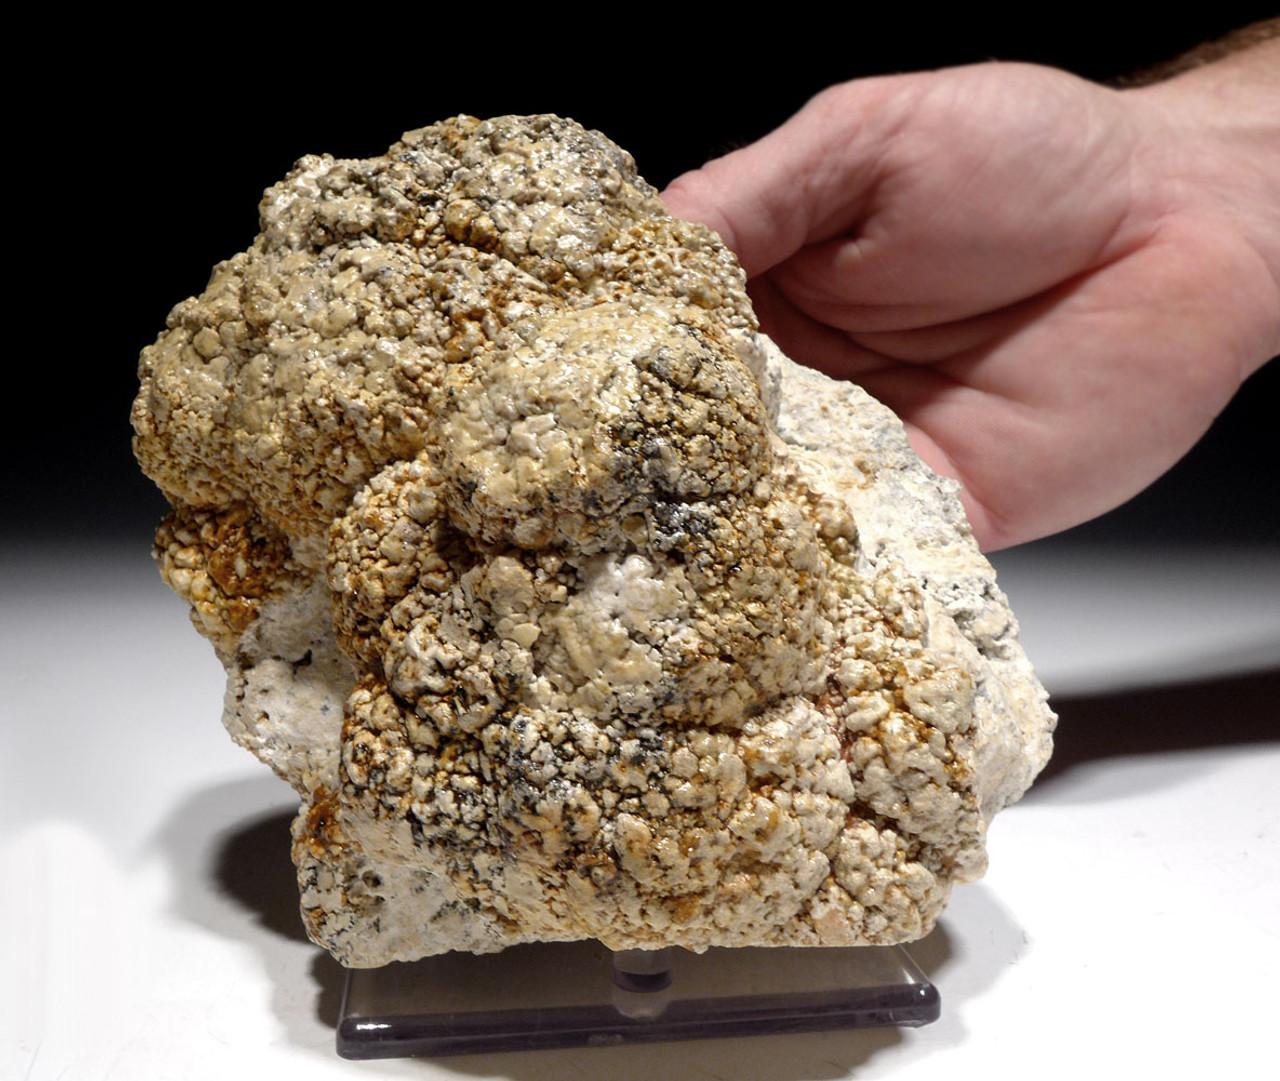 OLIGOCENE FOSSIL STROMATOLITE CYANOBACTERIA BALL COLONIES FROM AN ANCIENT LAKE  *ST028